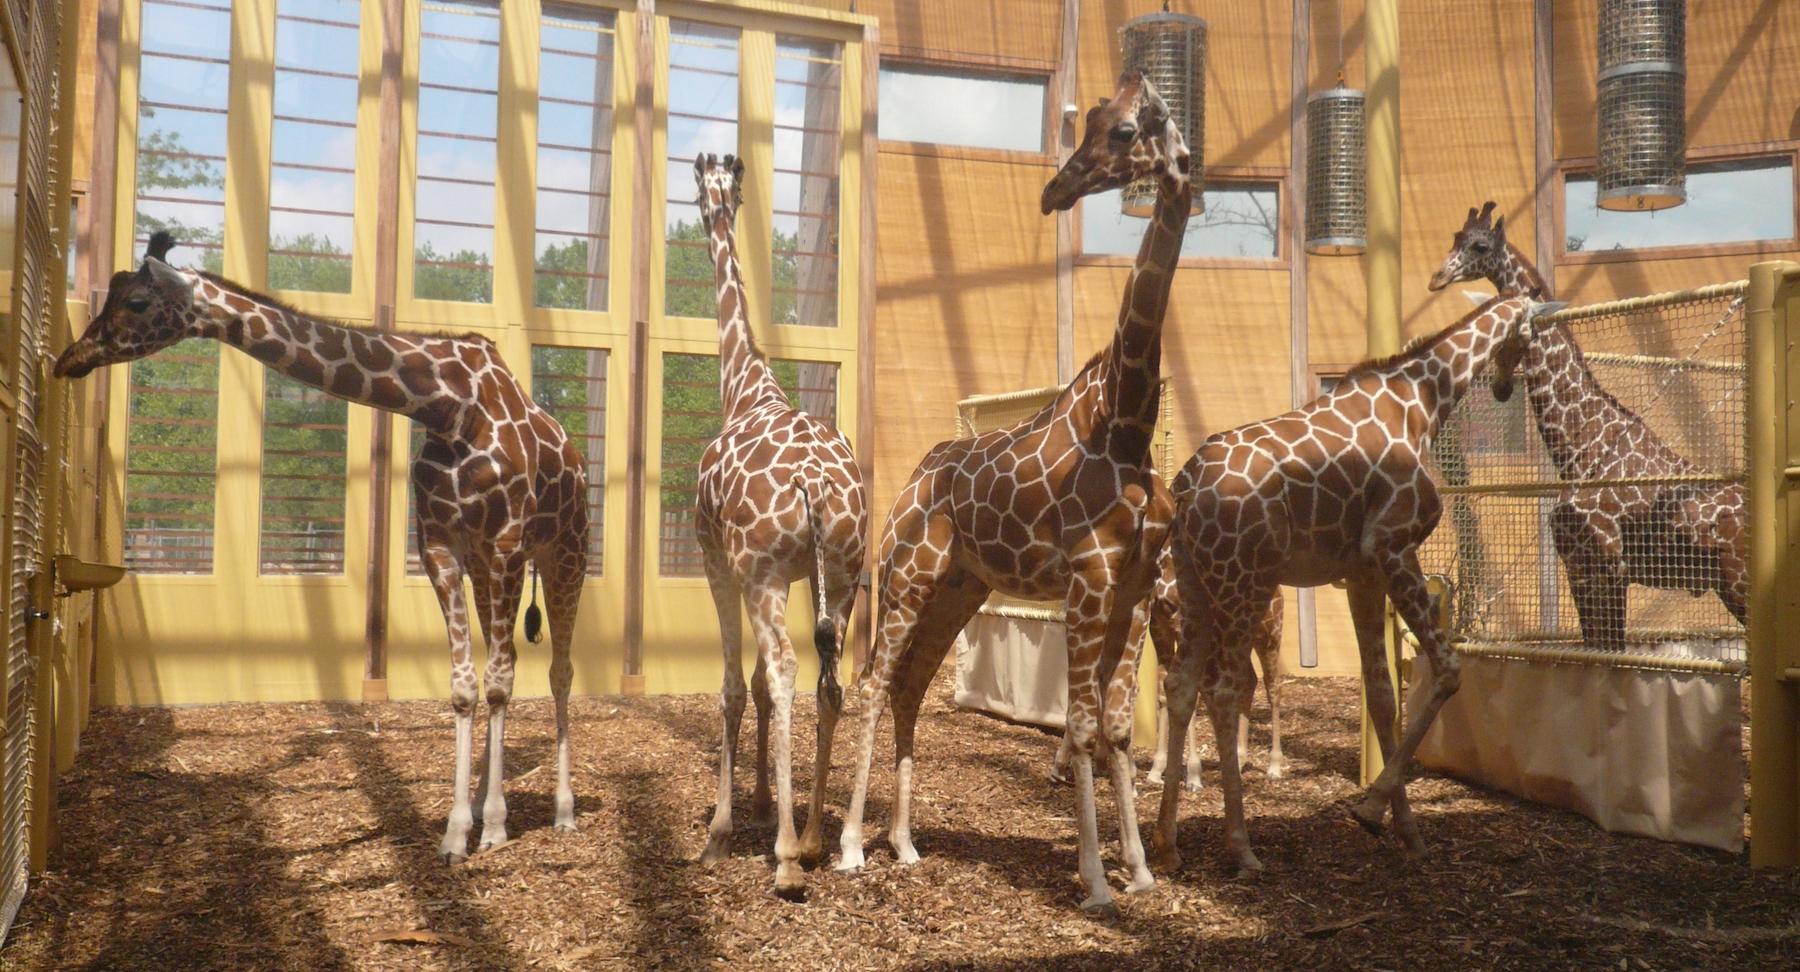 Giraffes inside Savannah House by LAM architects